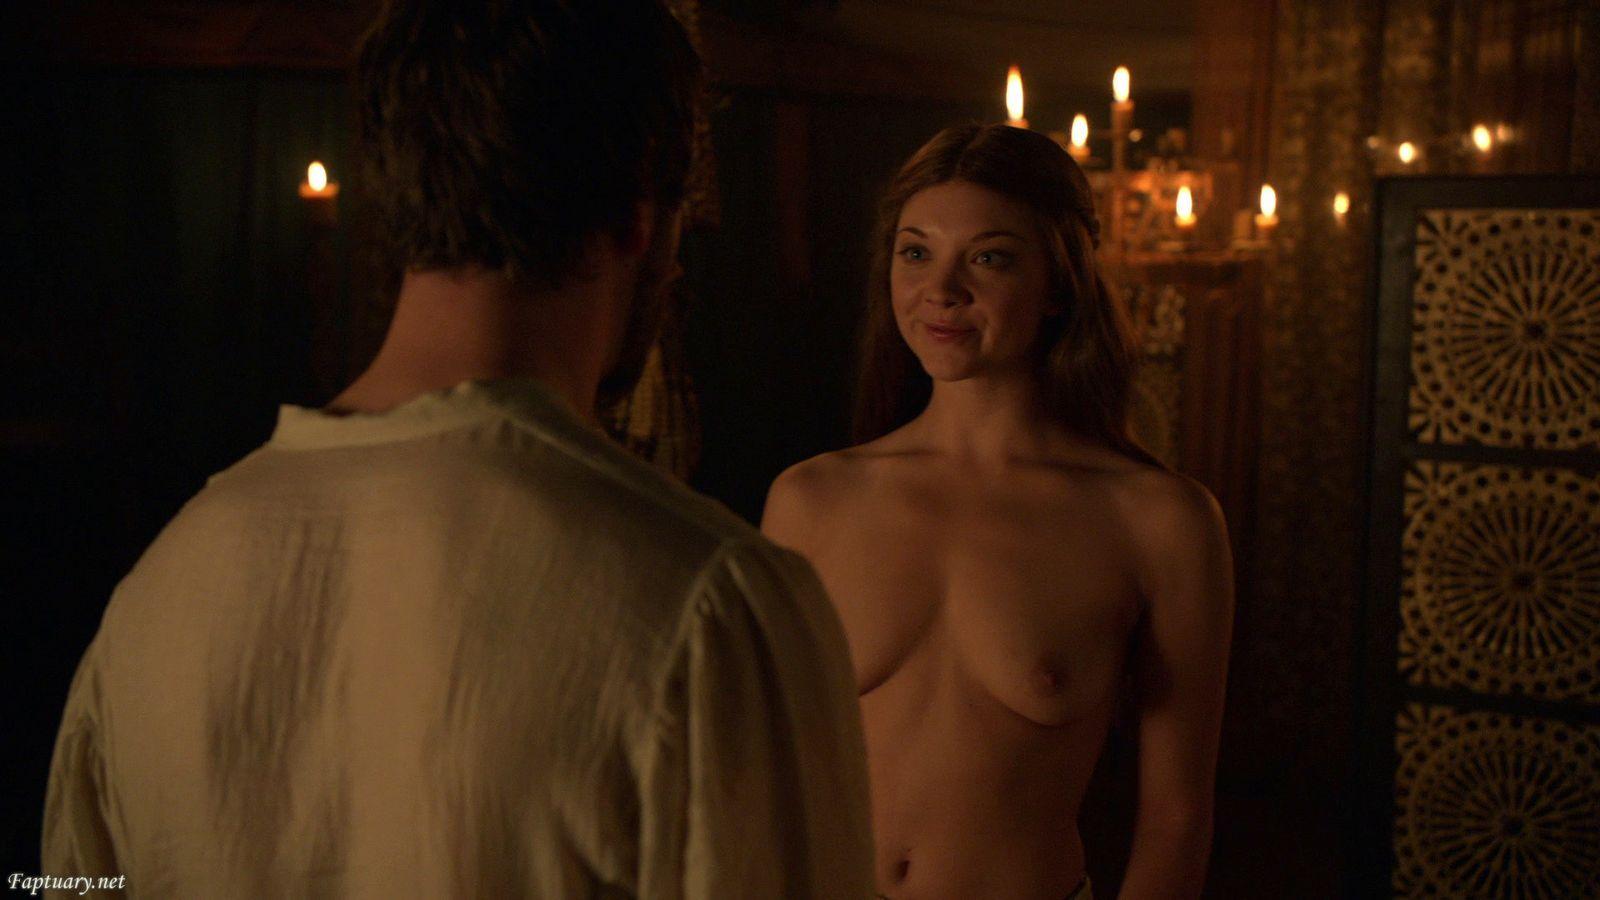 game of thrones sex scene uncensored